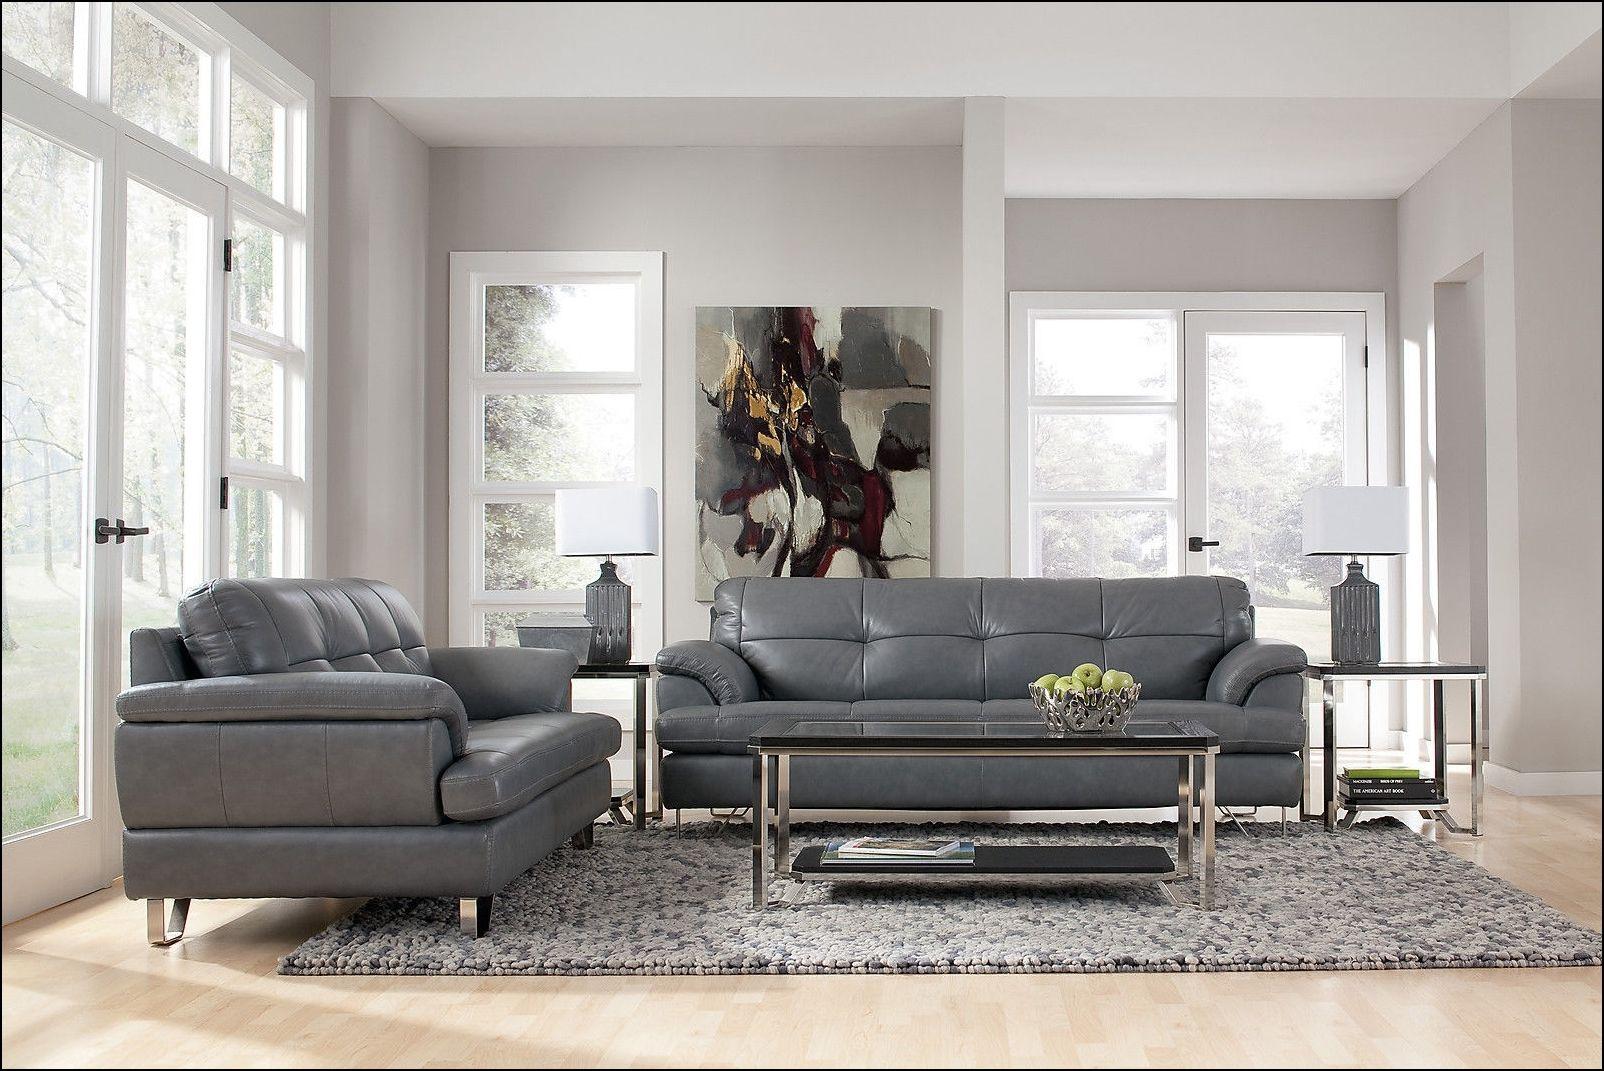 grey leather sofa cushion ideas  grey couch living room